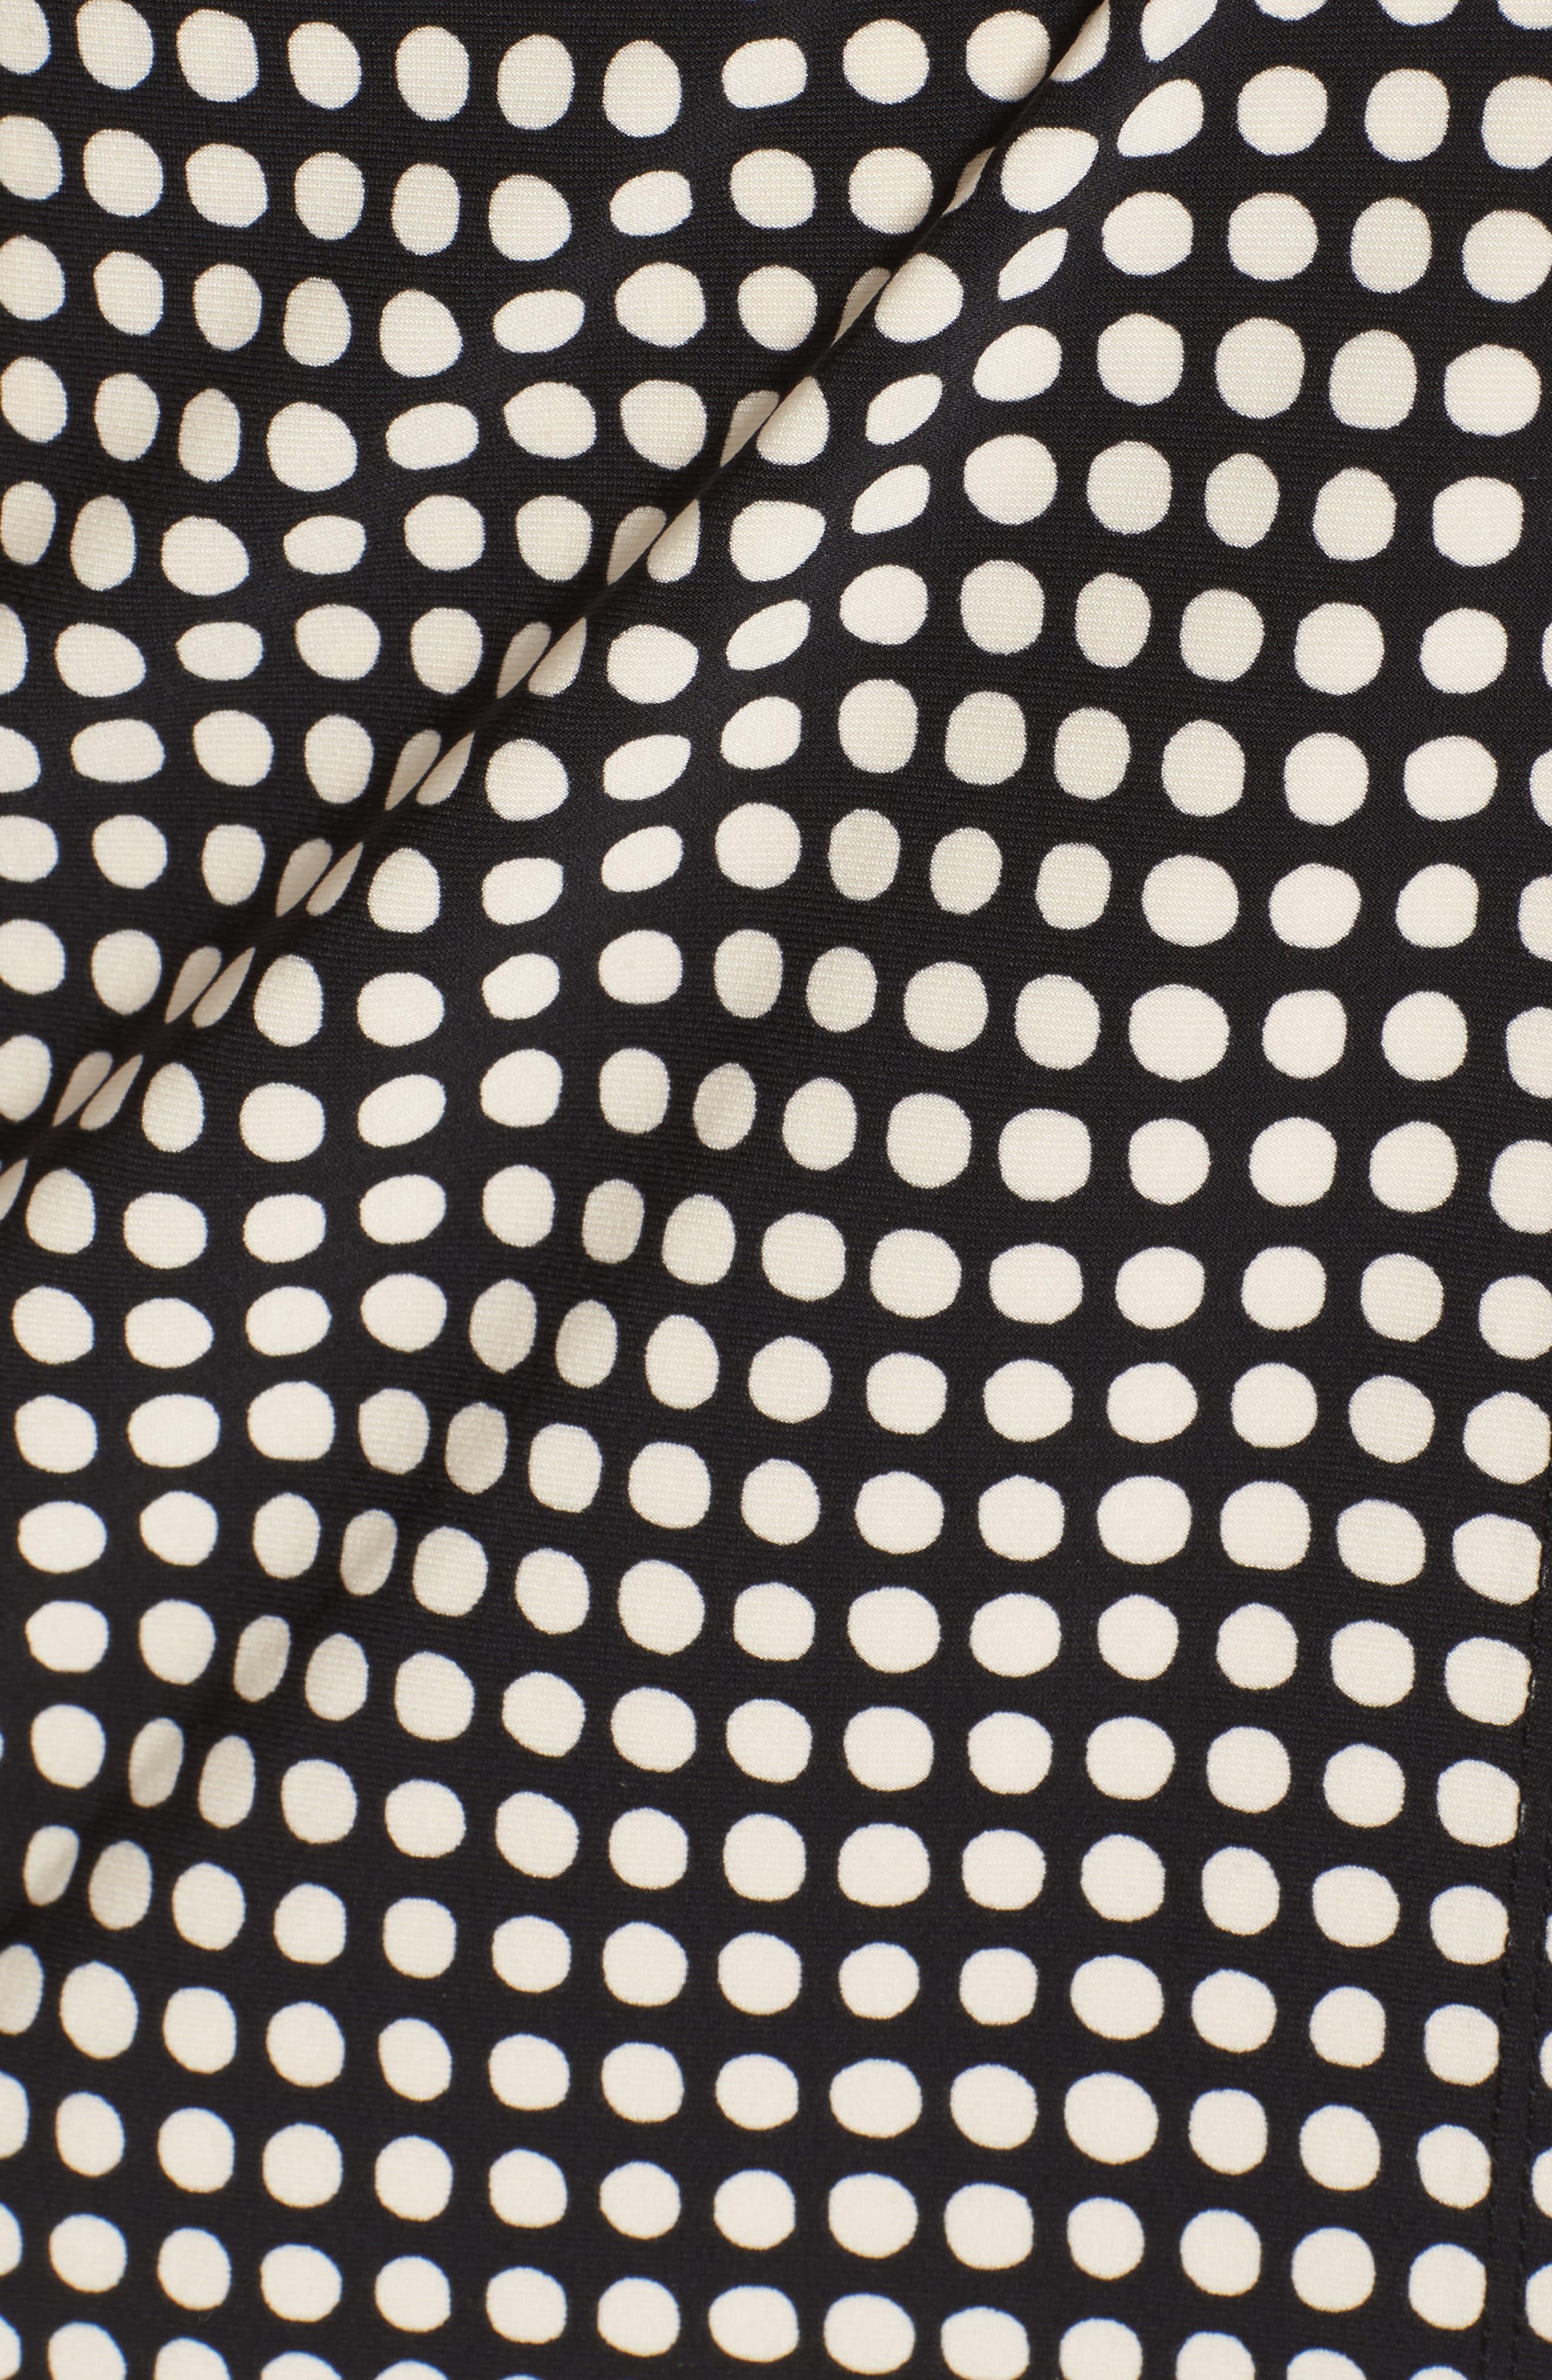 New York Pearly Dot Classic Wrap Dress,                             Alternate thumbnail 5, color,                             Black/ Parchment